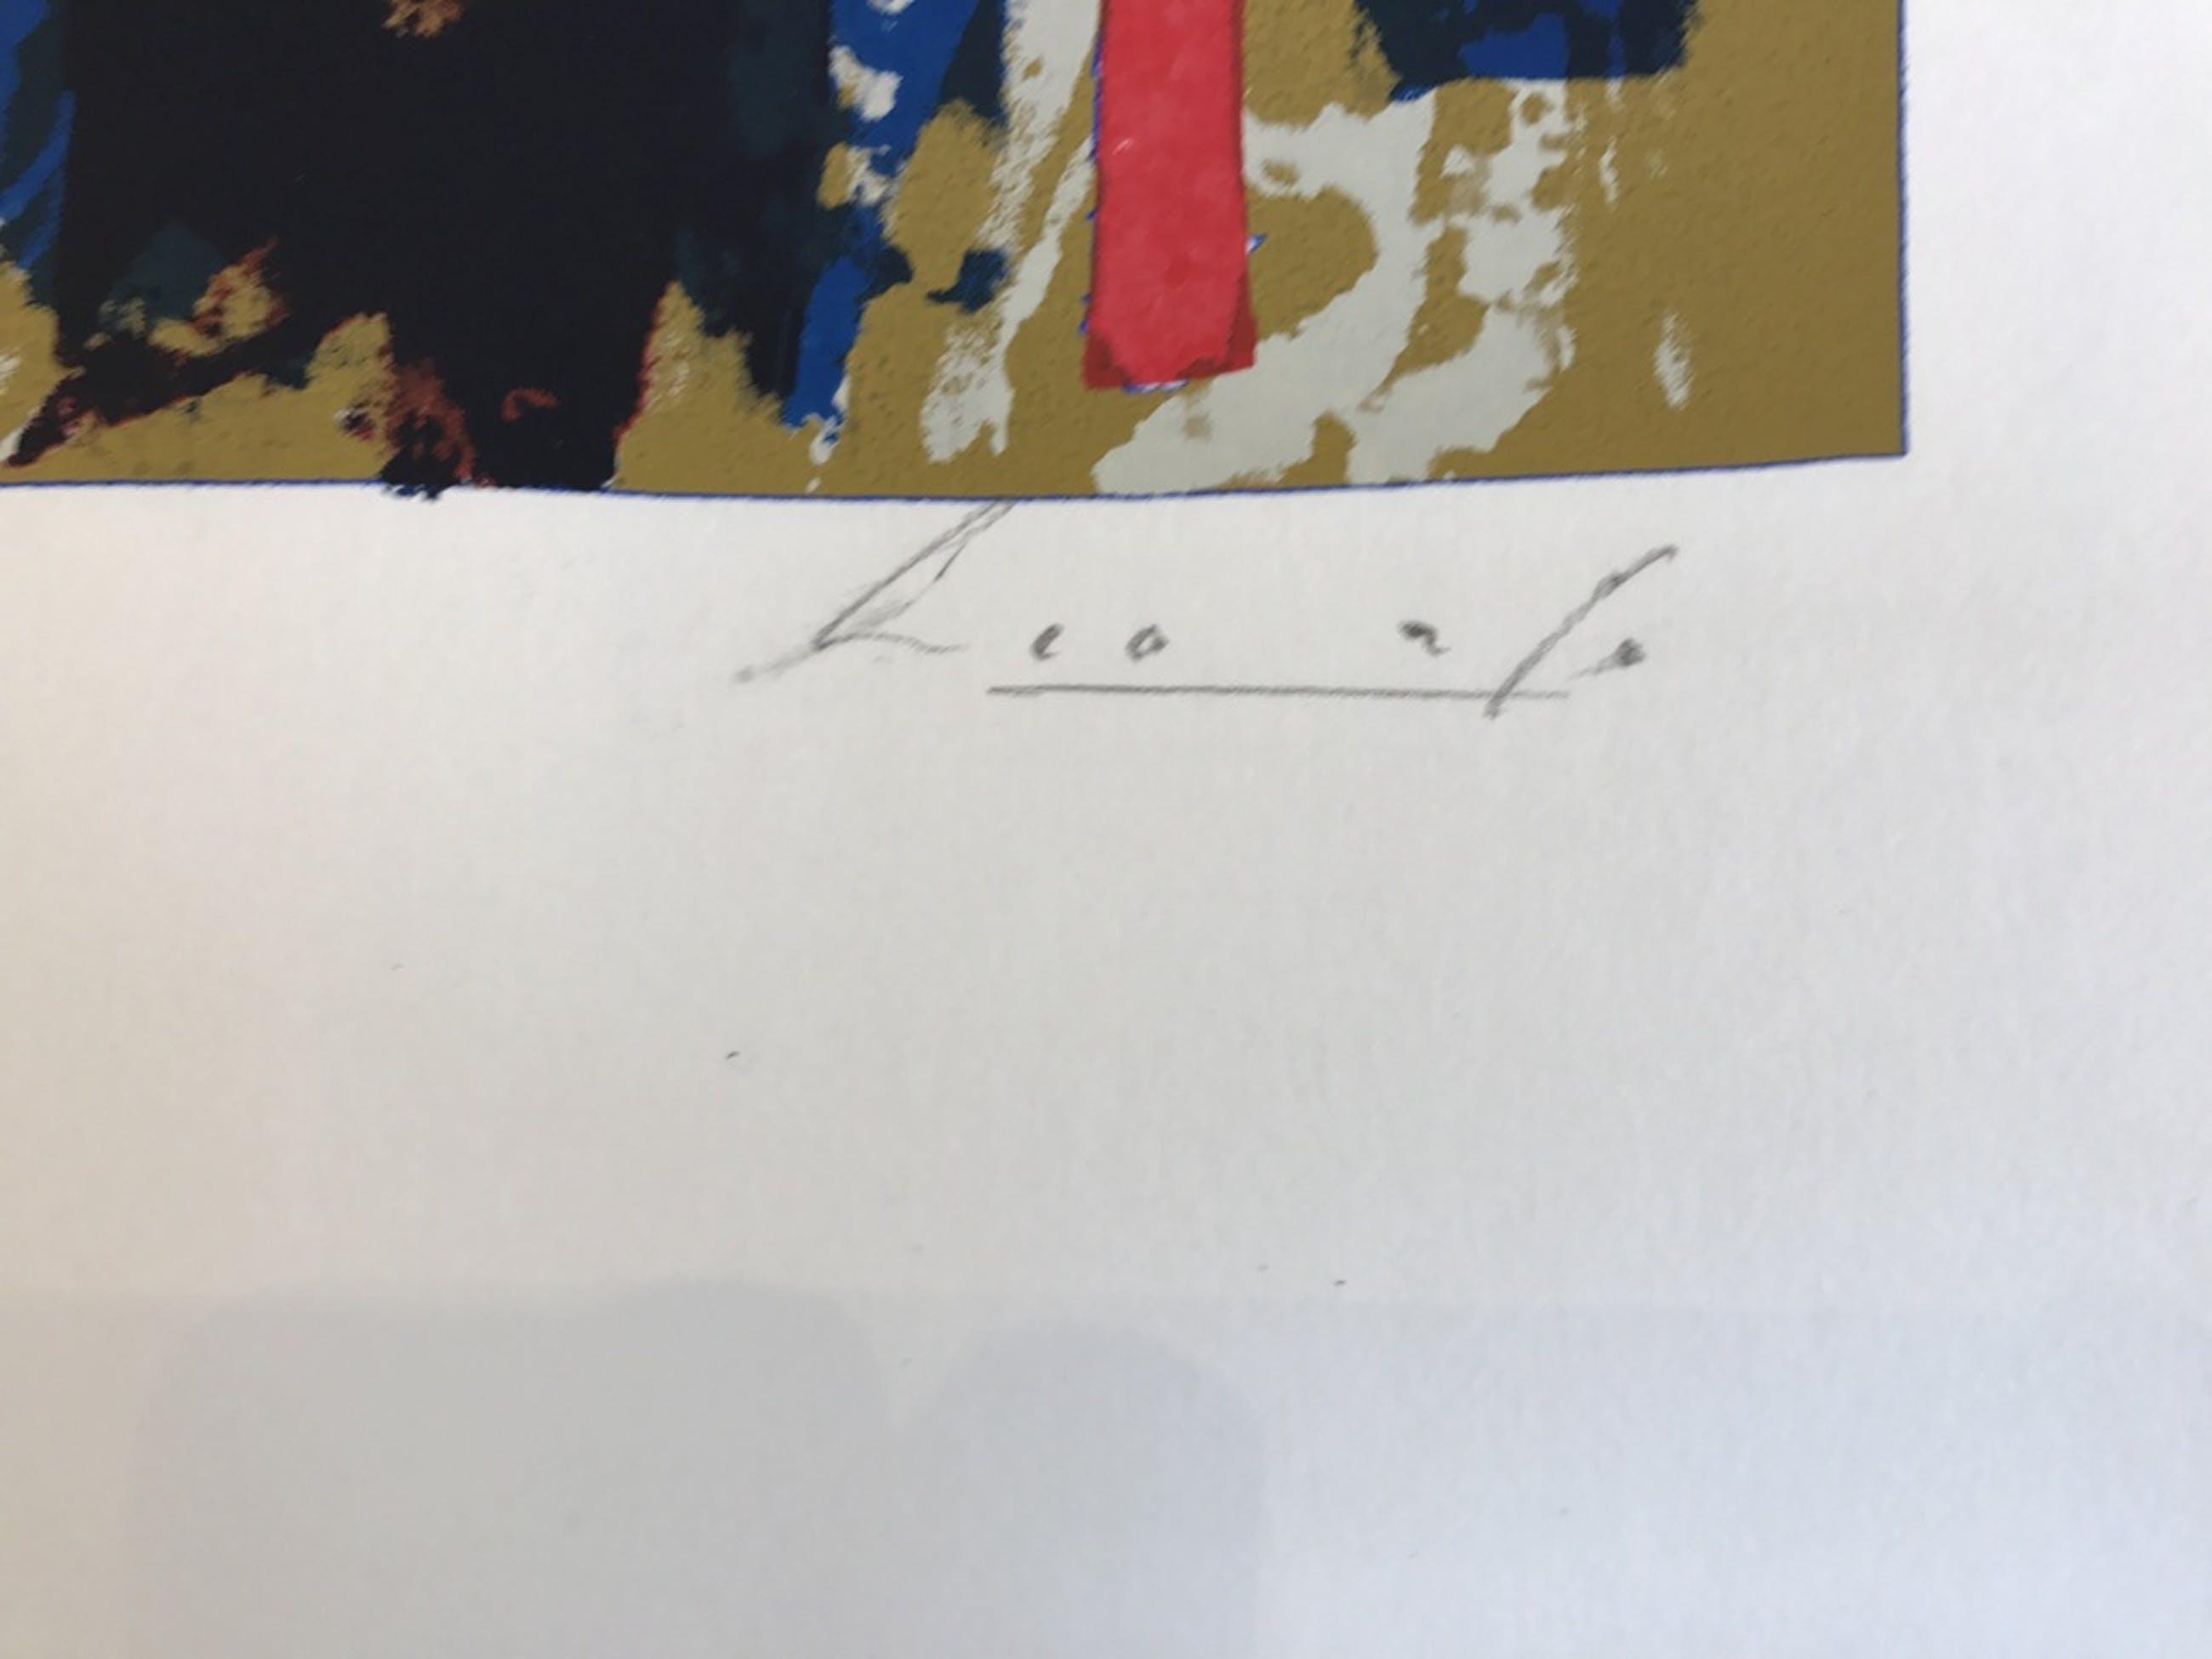 John Lie A Fo   1 originele zeefdruk / Litho gesigneerd  kopen? Bied vanaf 1!